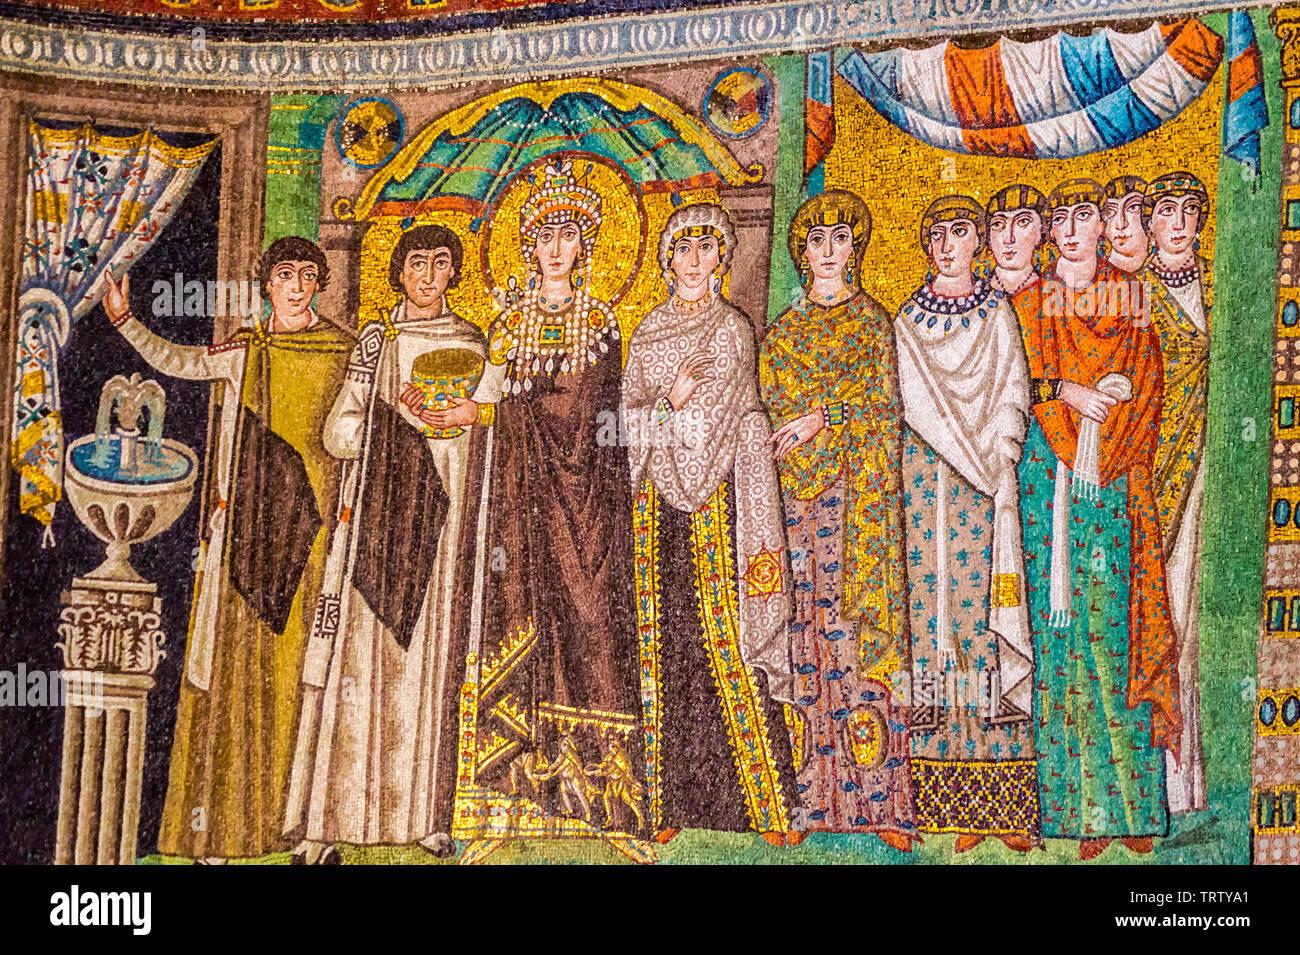 mosaic-of-empress-theodora-and-attendants-basilica-of-san-vitale-ad547-mosaic-ravenna-emilia-romagna-italy-TRTYA1.jpg